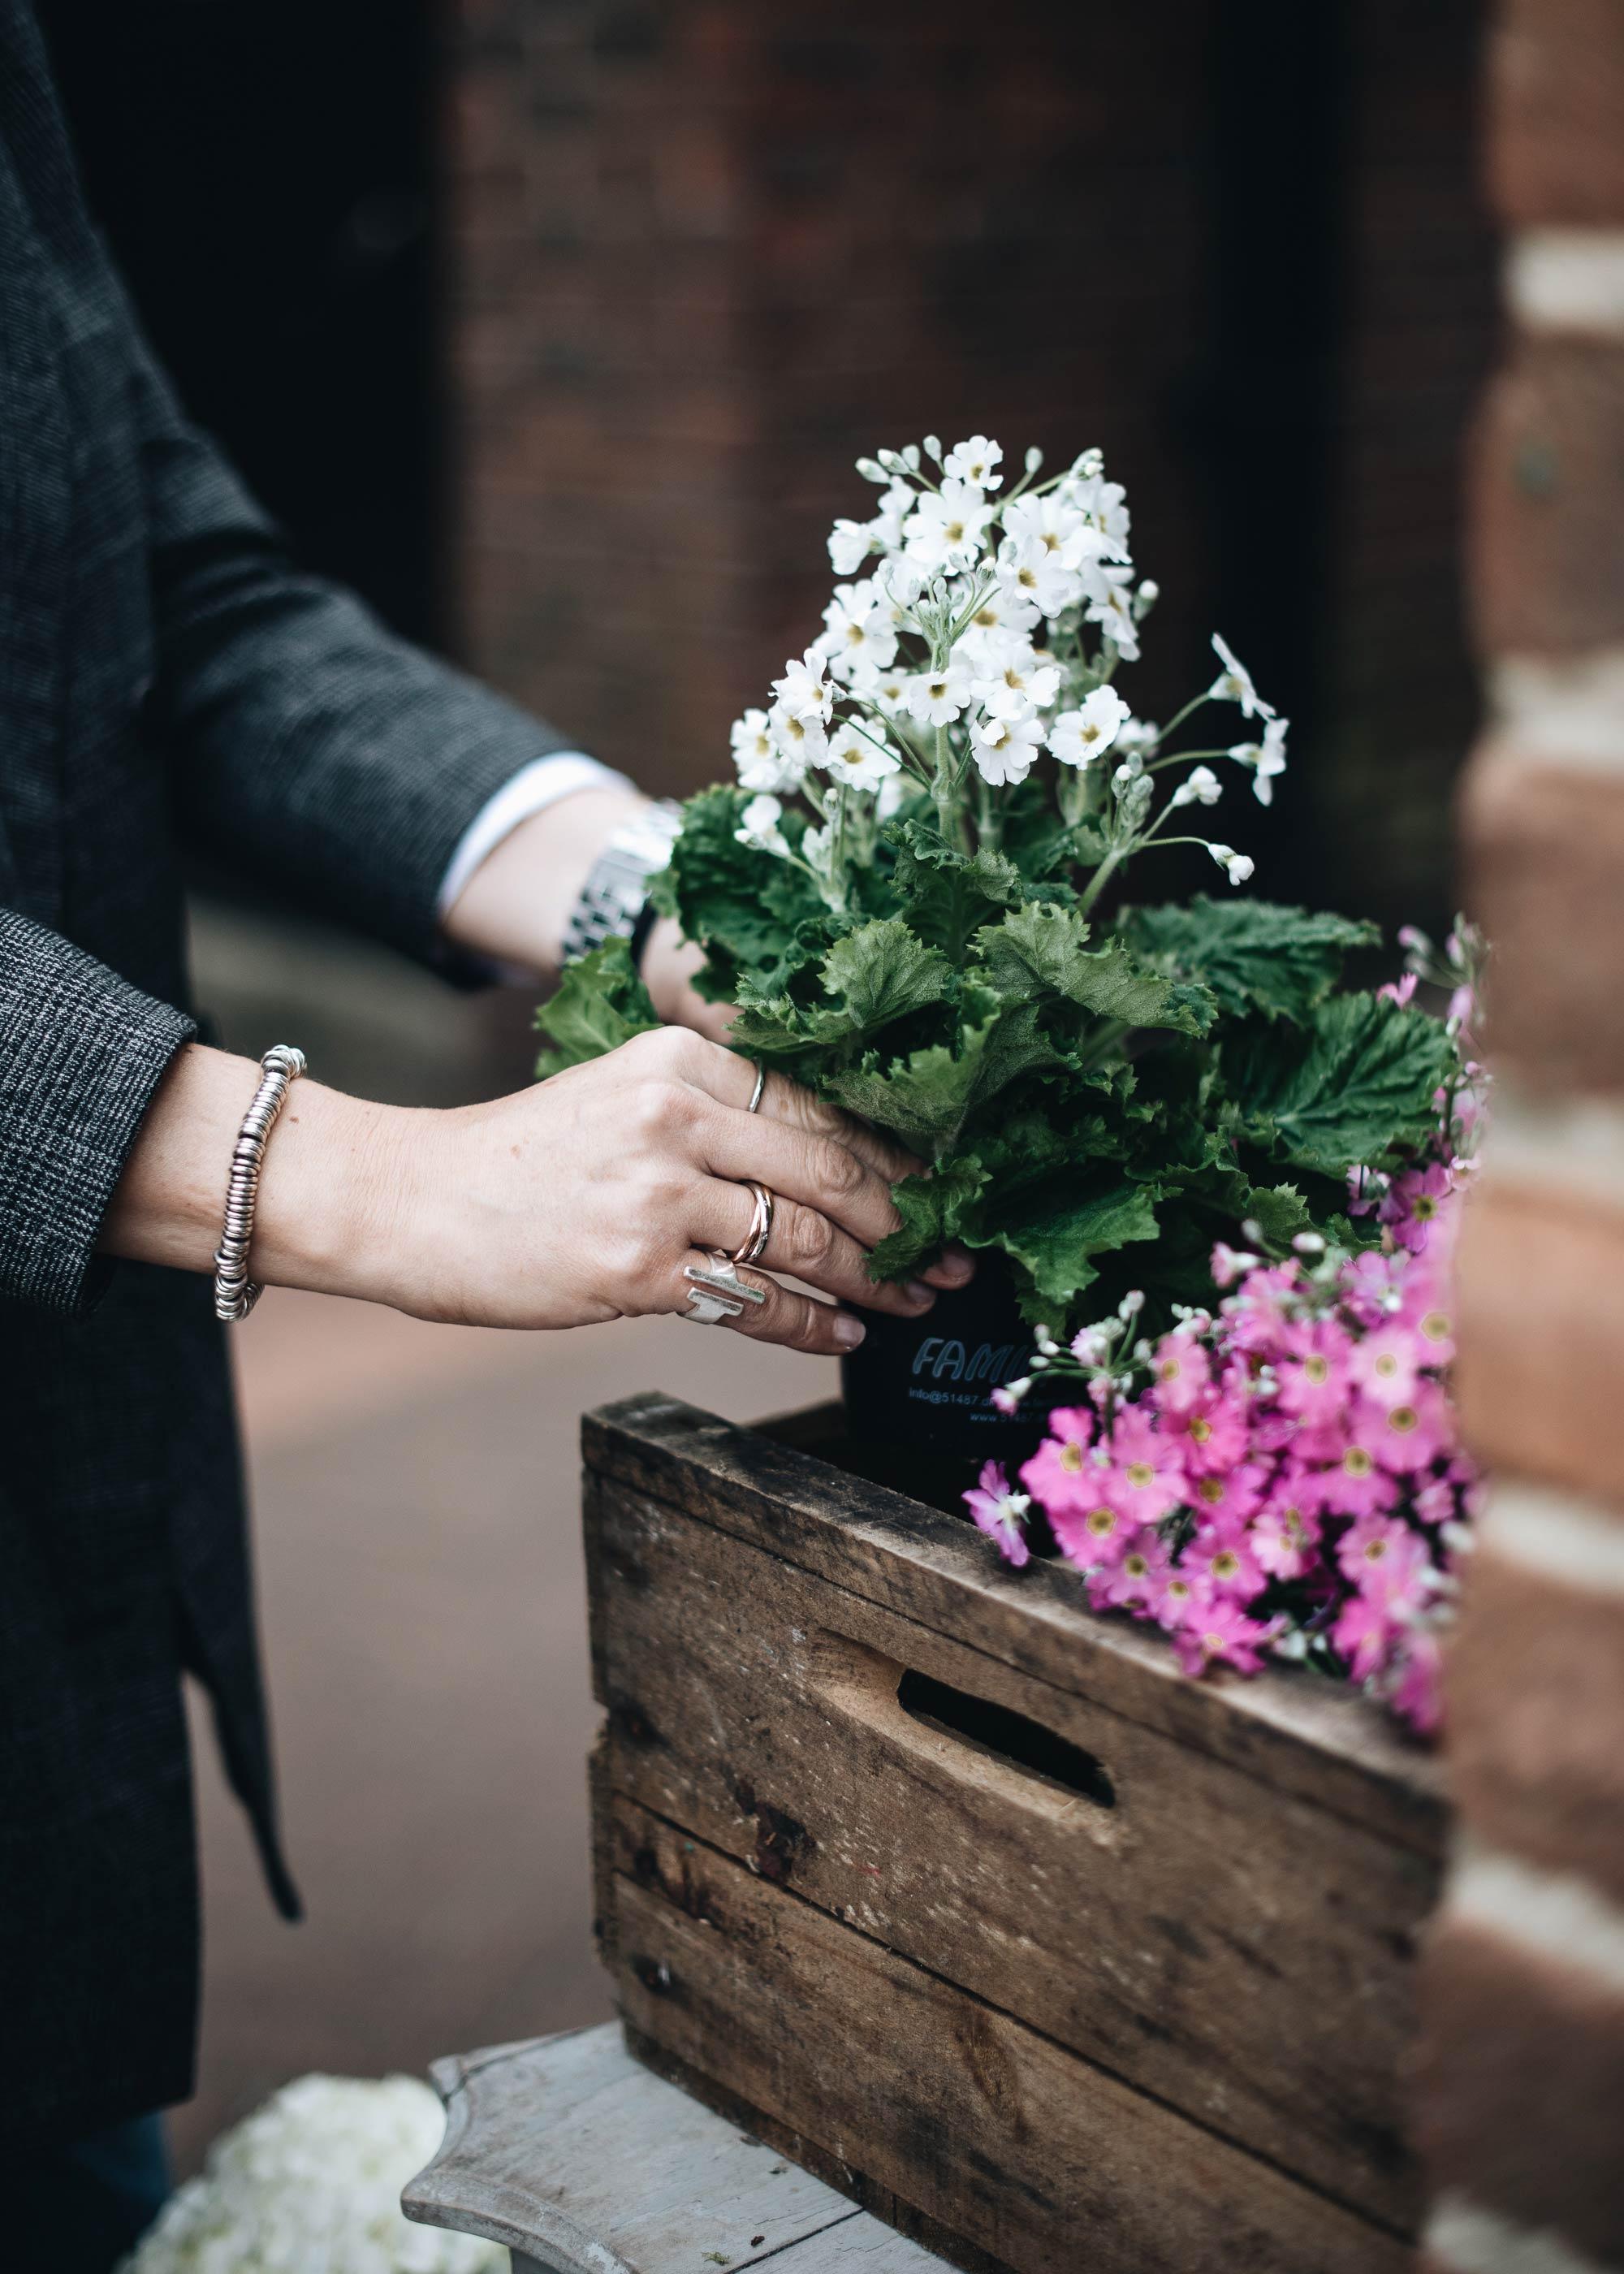 4-buying-spring-plants.jpg